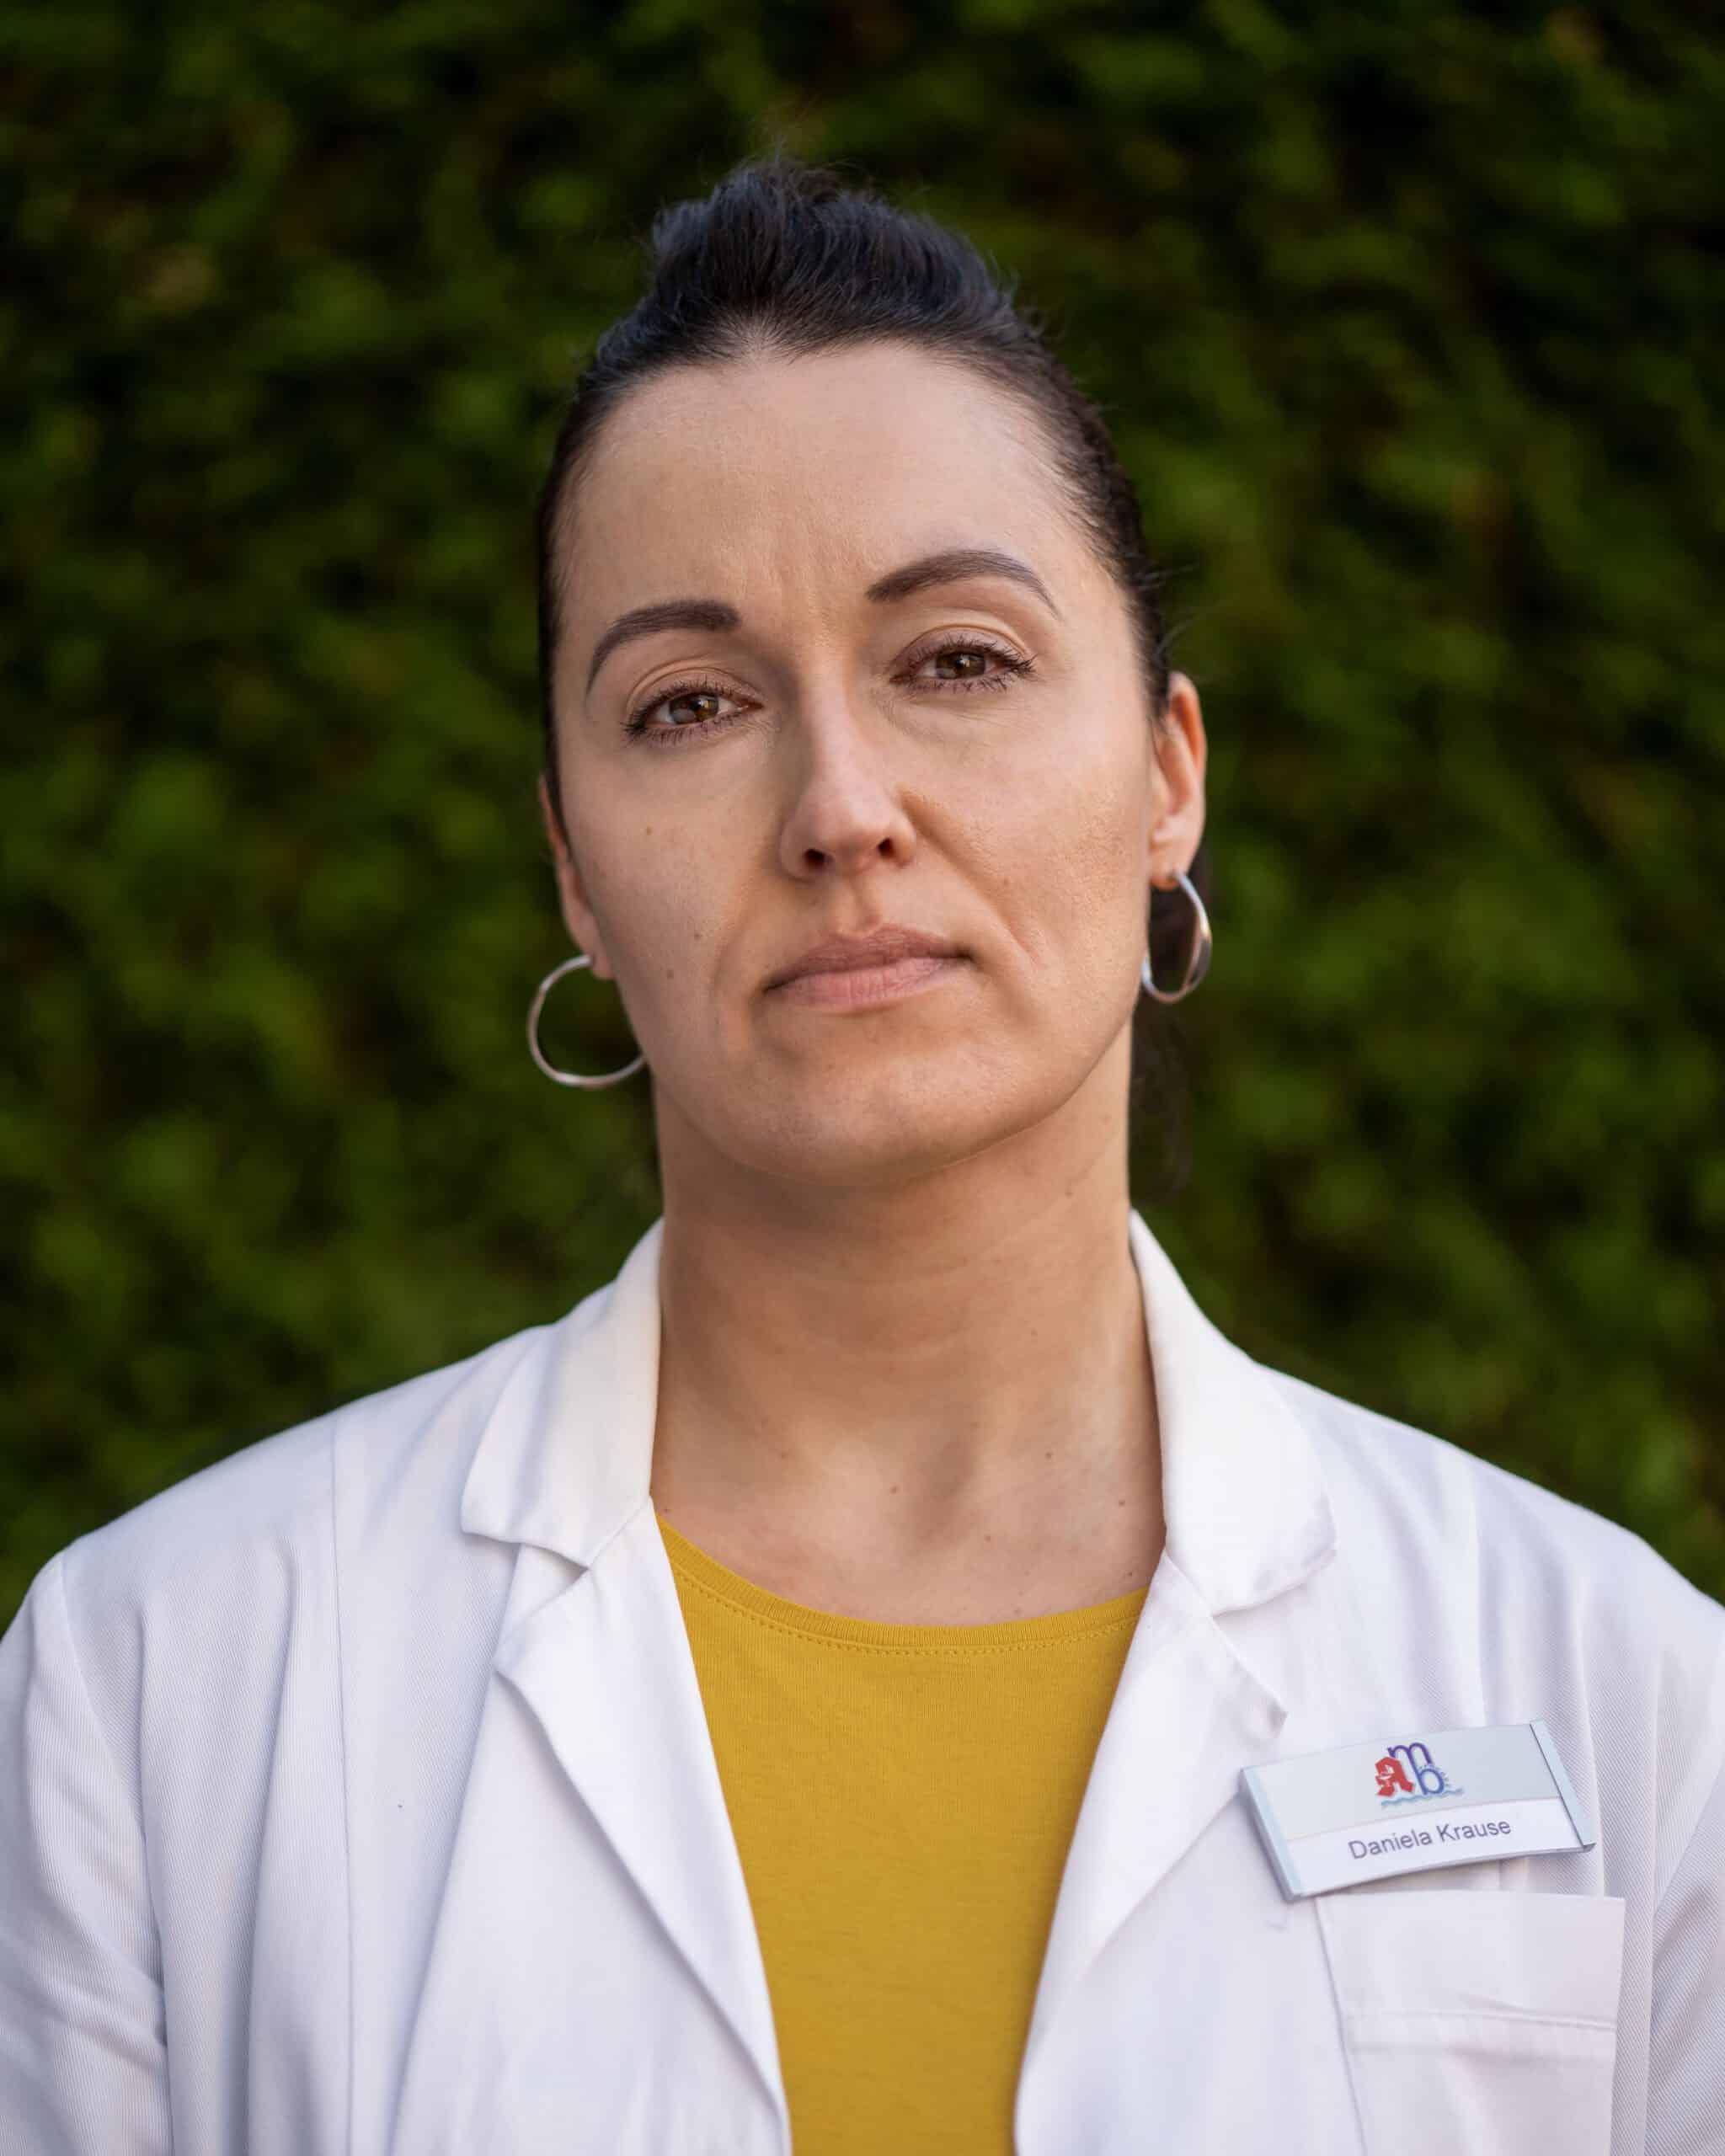 Frau Daniela Krause (PTA)